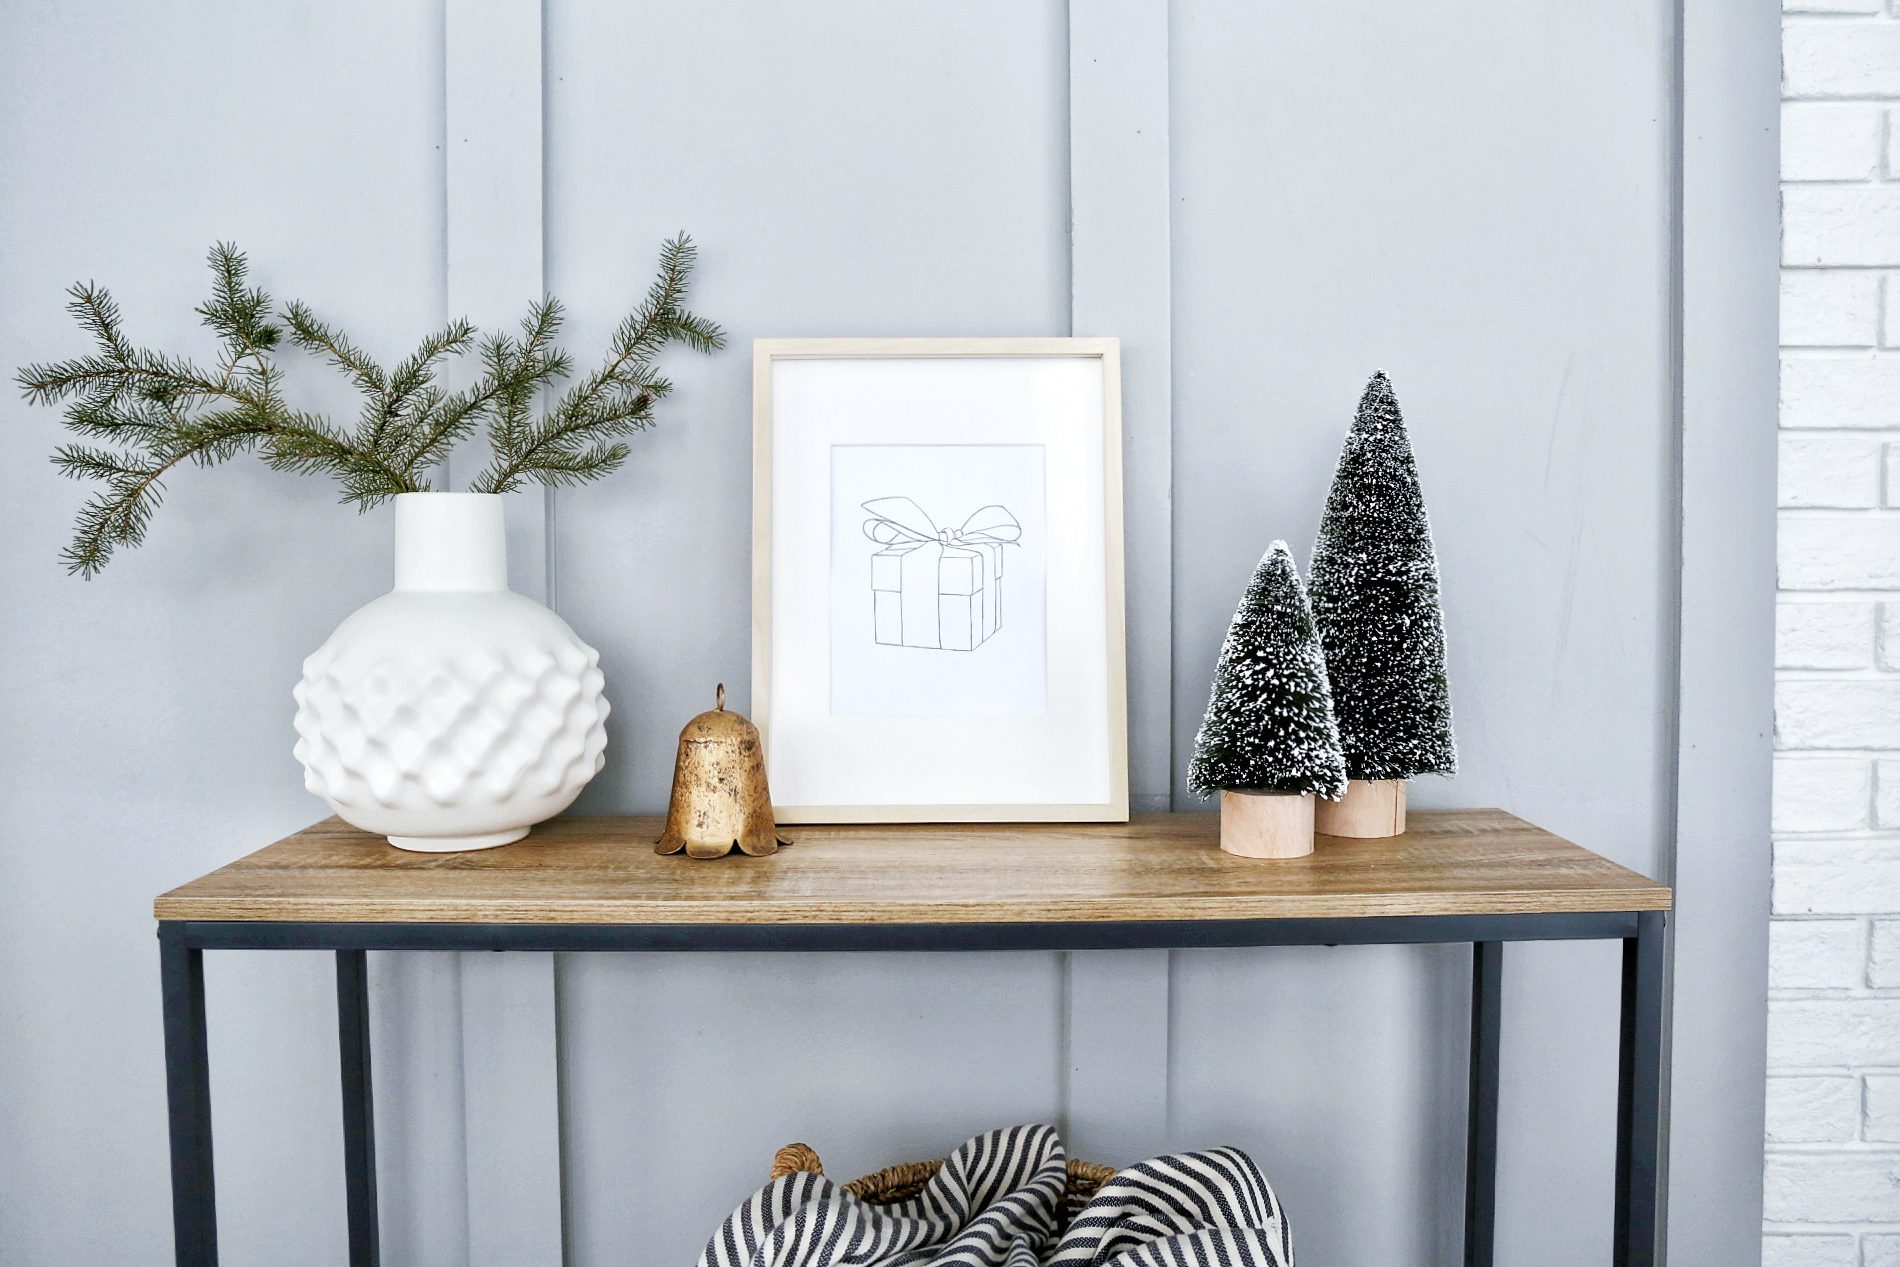 Simple and minimal winter artwork